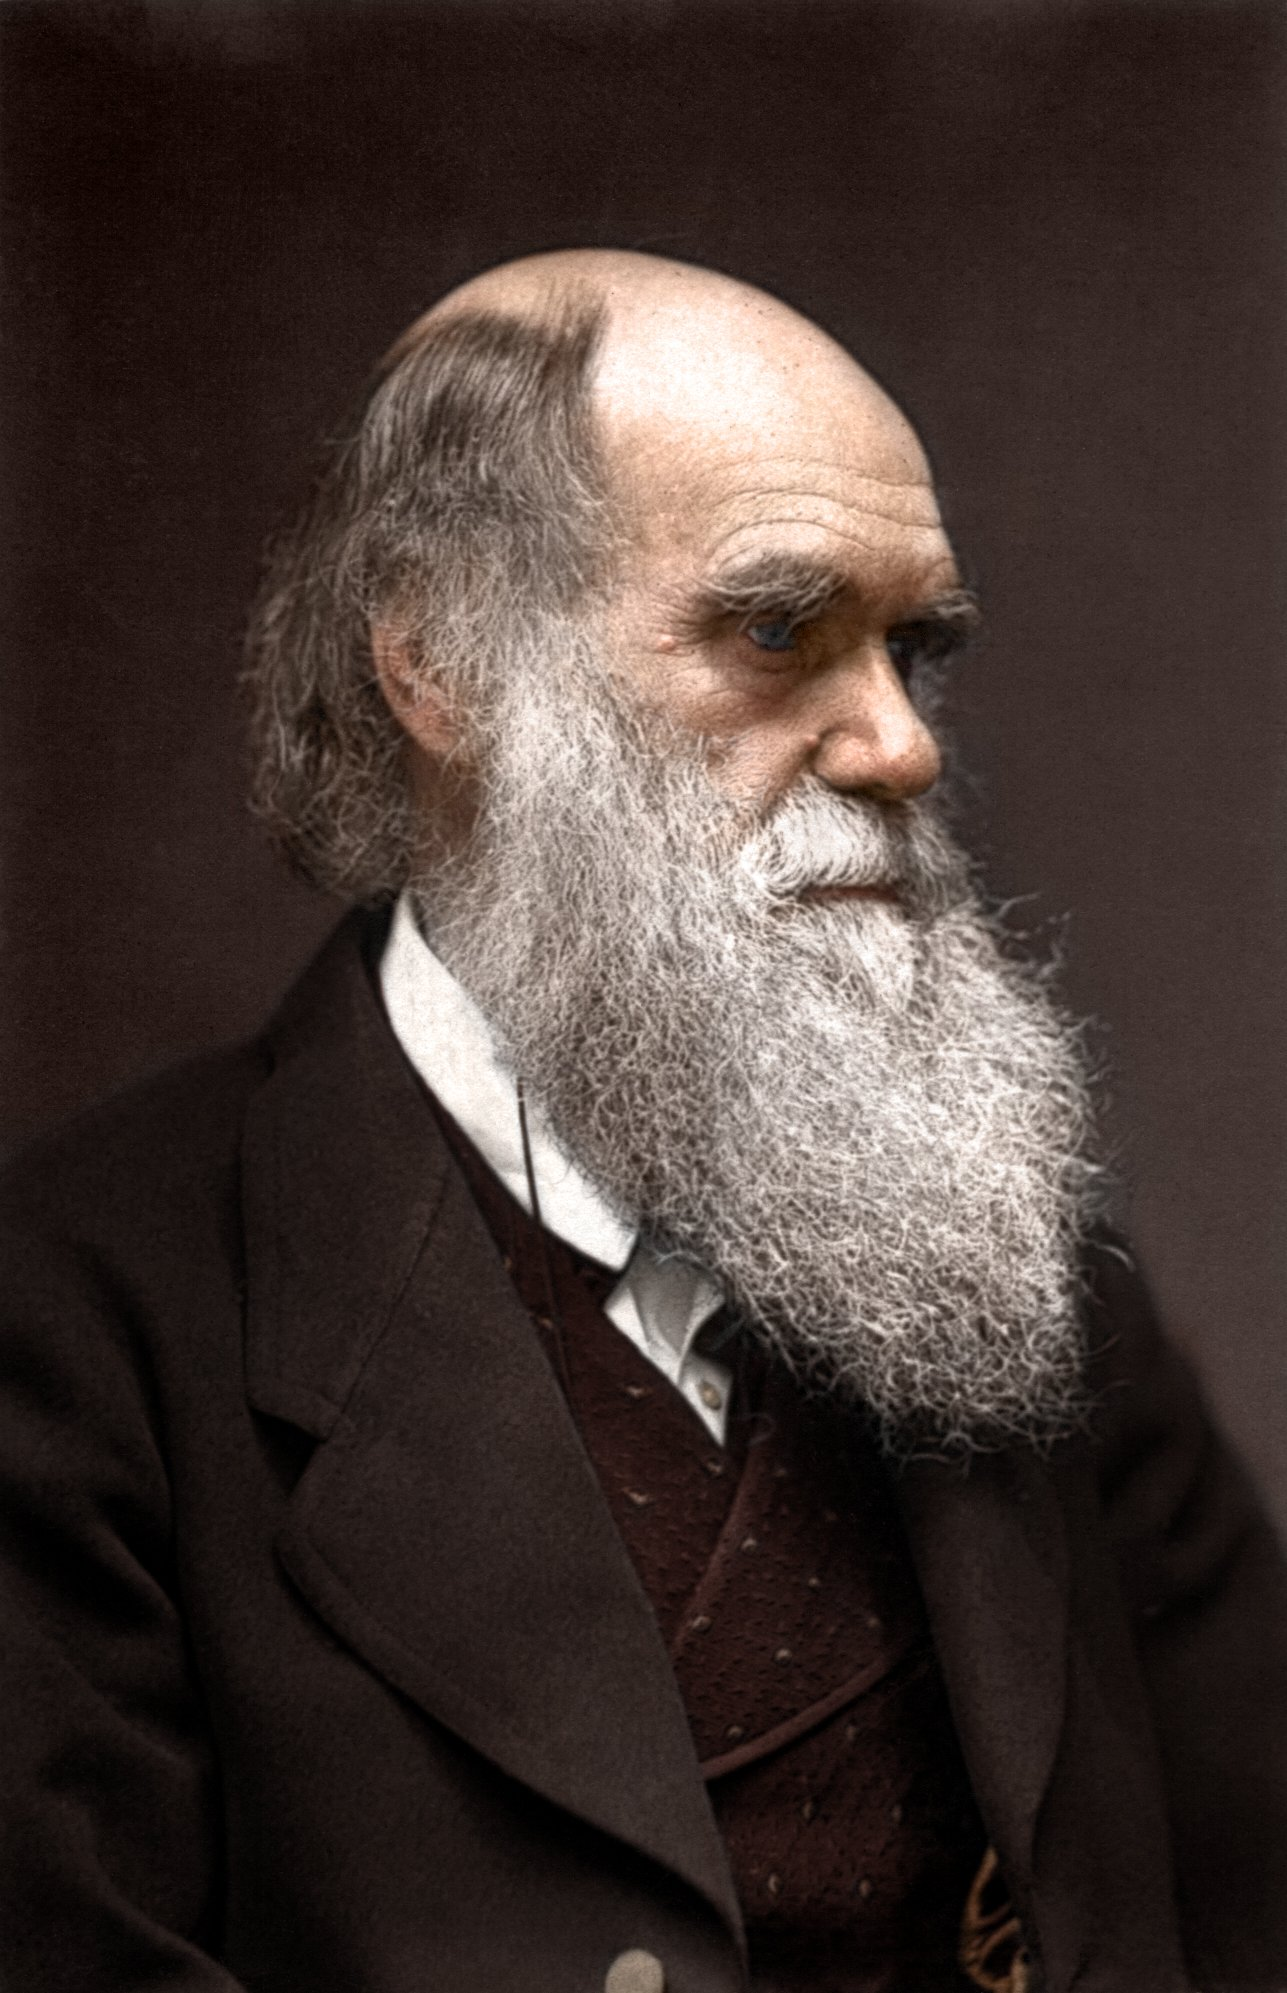 Wallpapers Of The Day Charles Darwin 1287x1993 Charles Darwin 1287x1993